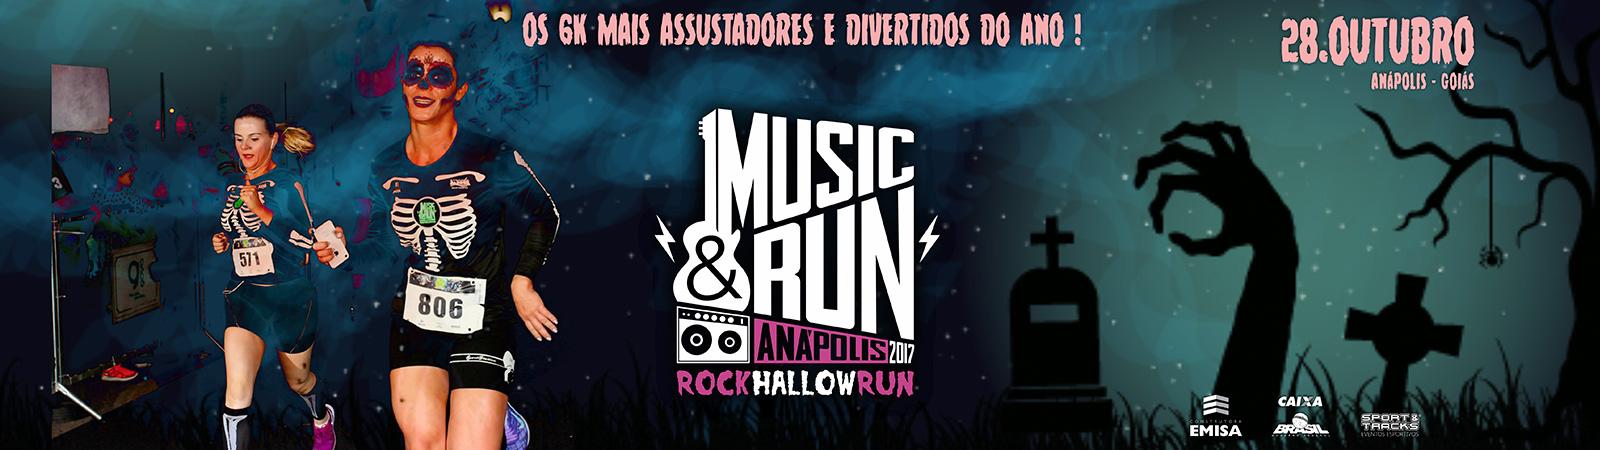 MUSIC & RUN - ANÁPOLIS - 2017